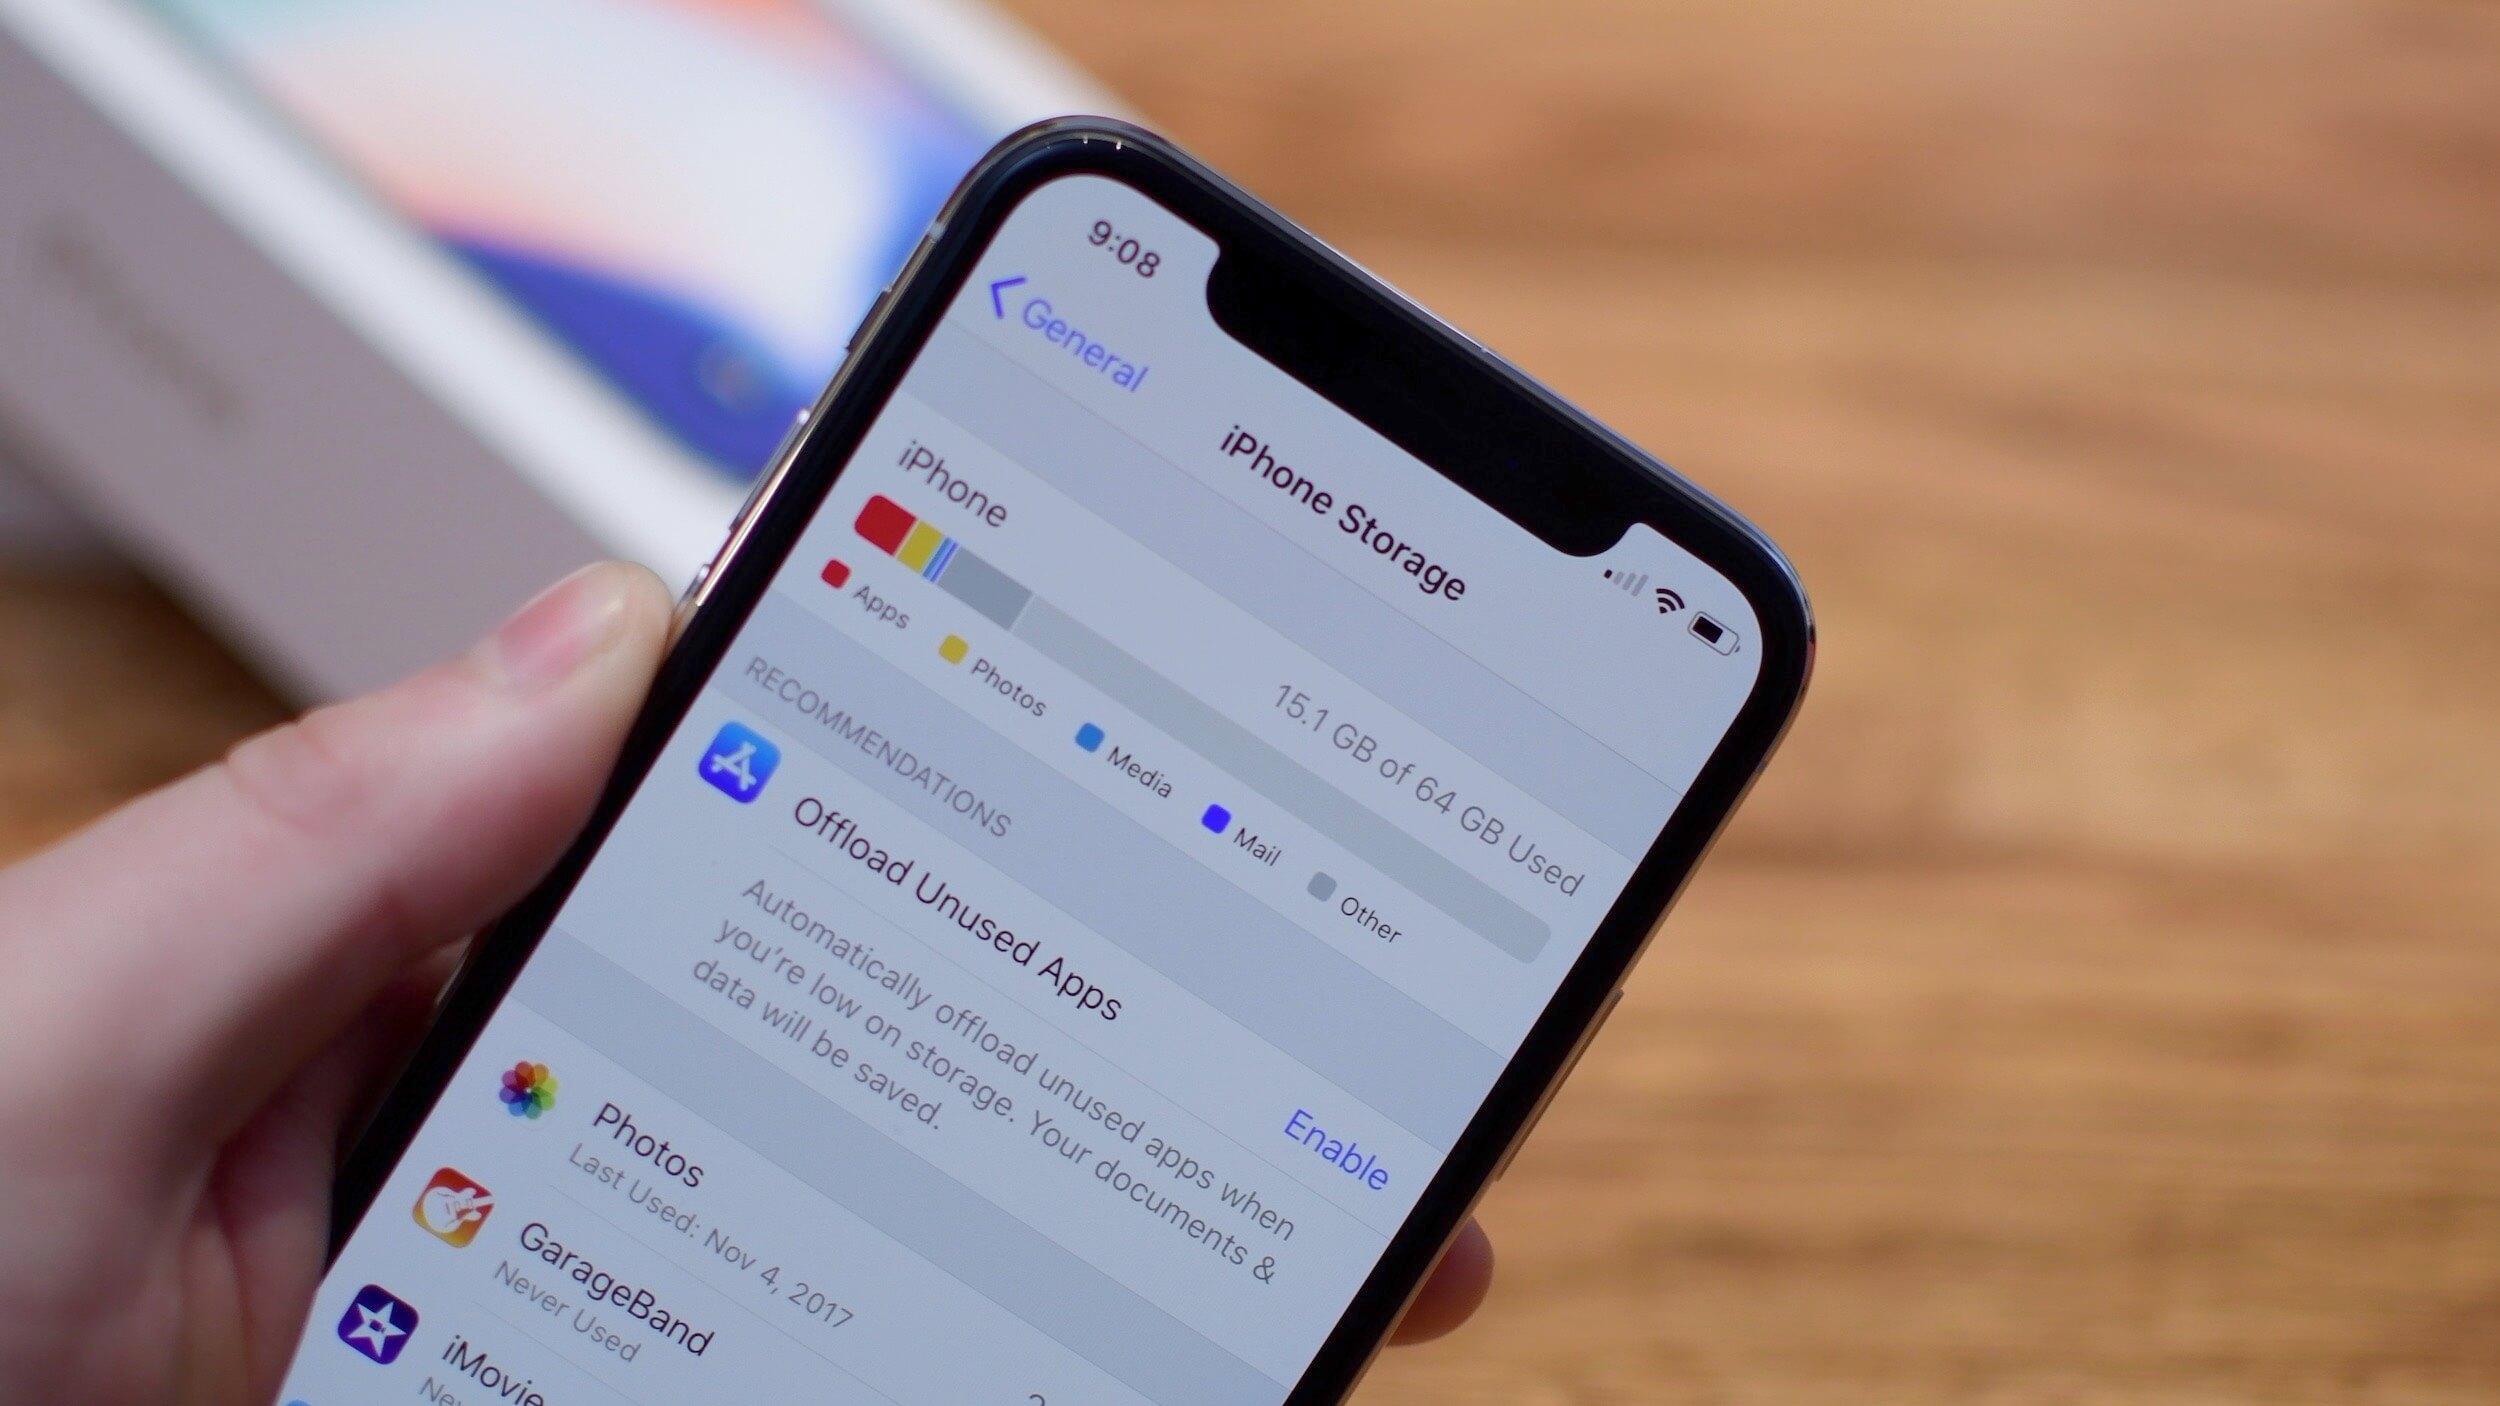 Потребителям не нужен iPhone с 512 ГБ памяти